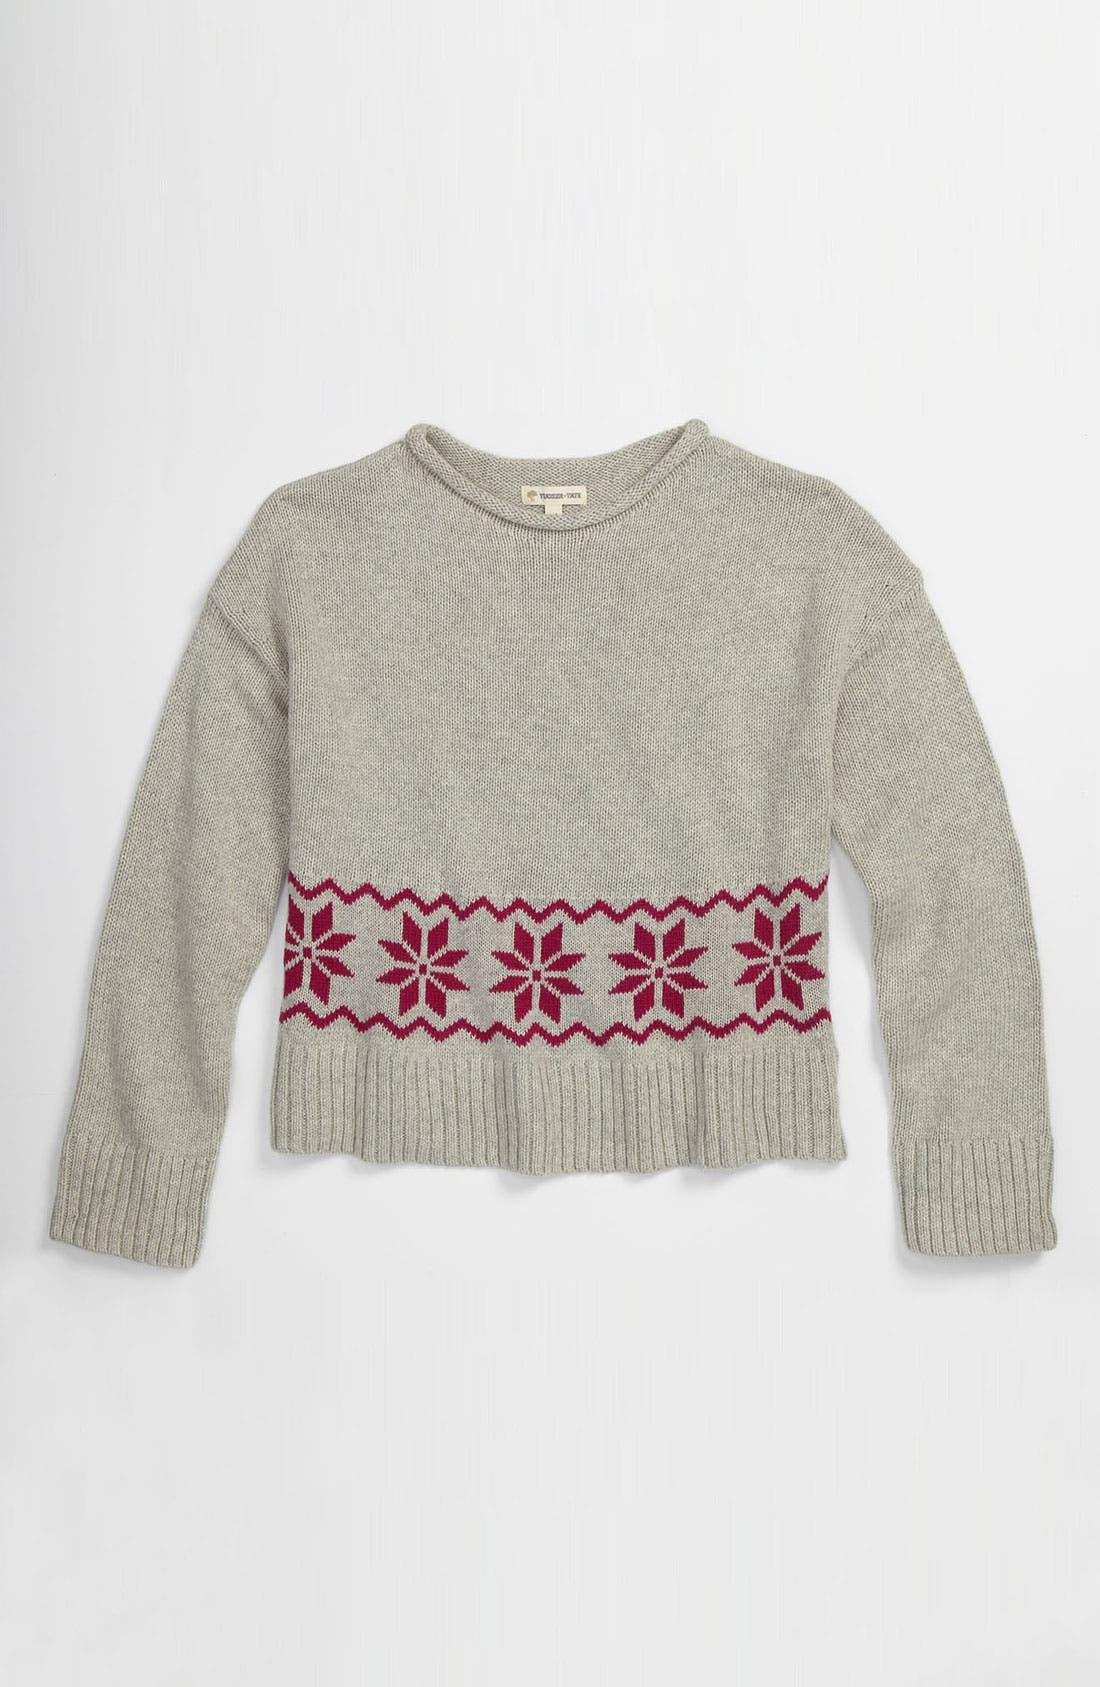 Alternate Image 1 Selected - Tucker + Tate 'Lydia' Sweater (Little Girls)